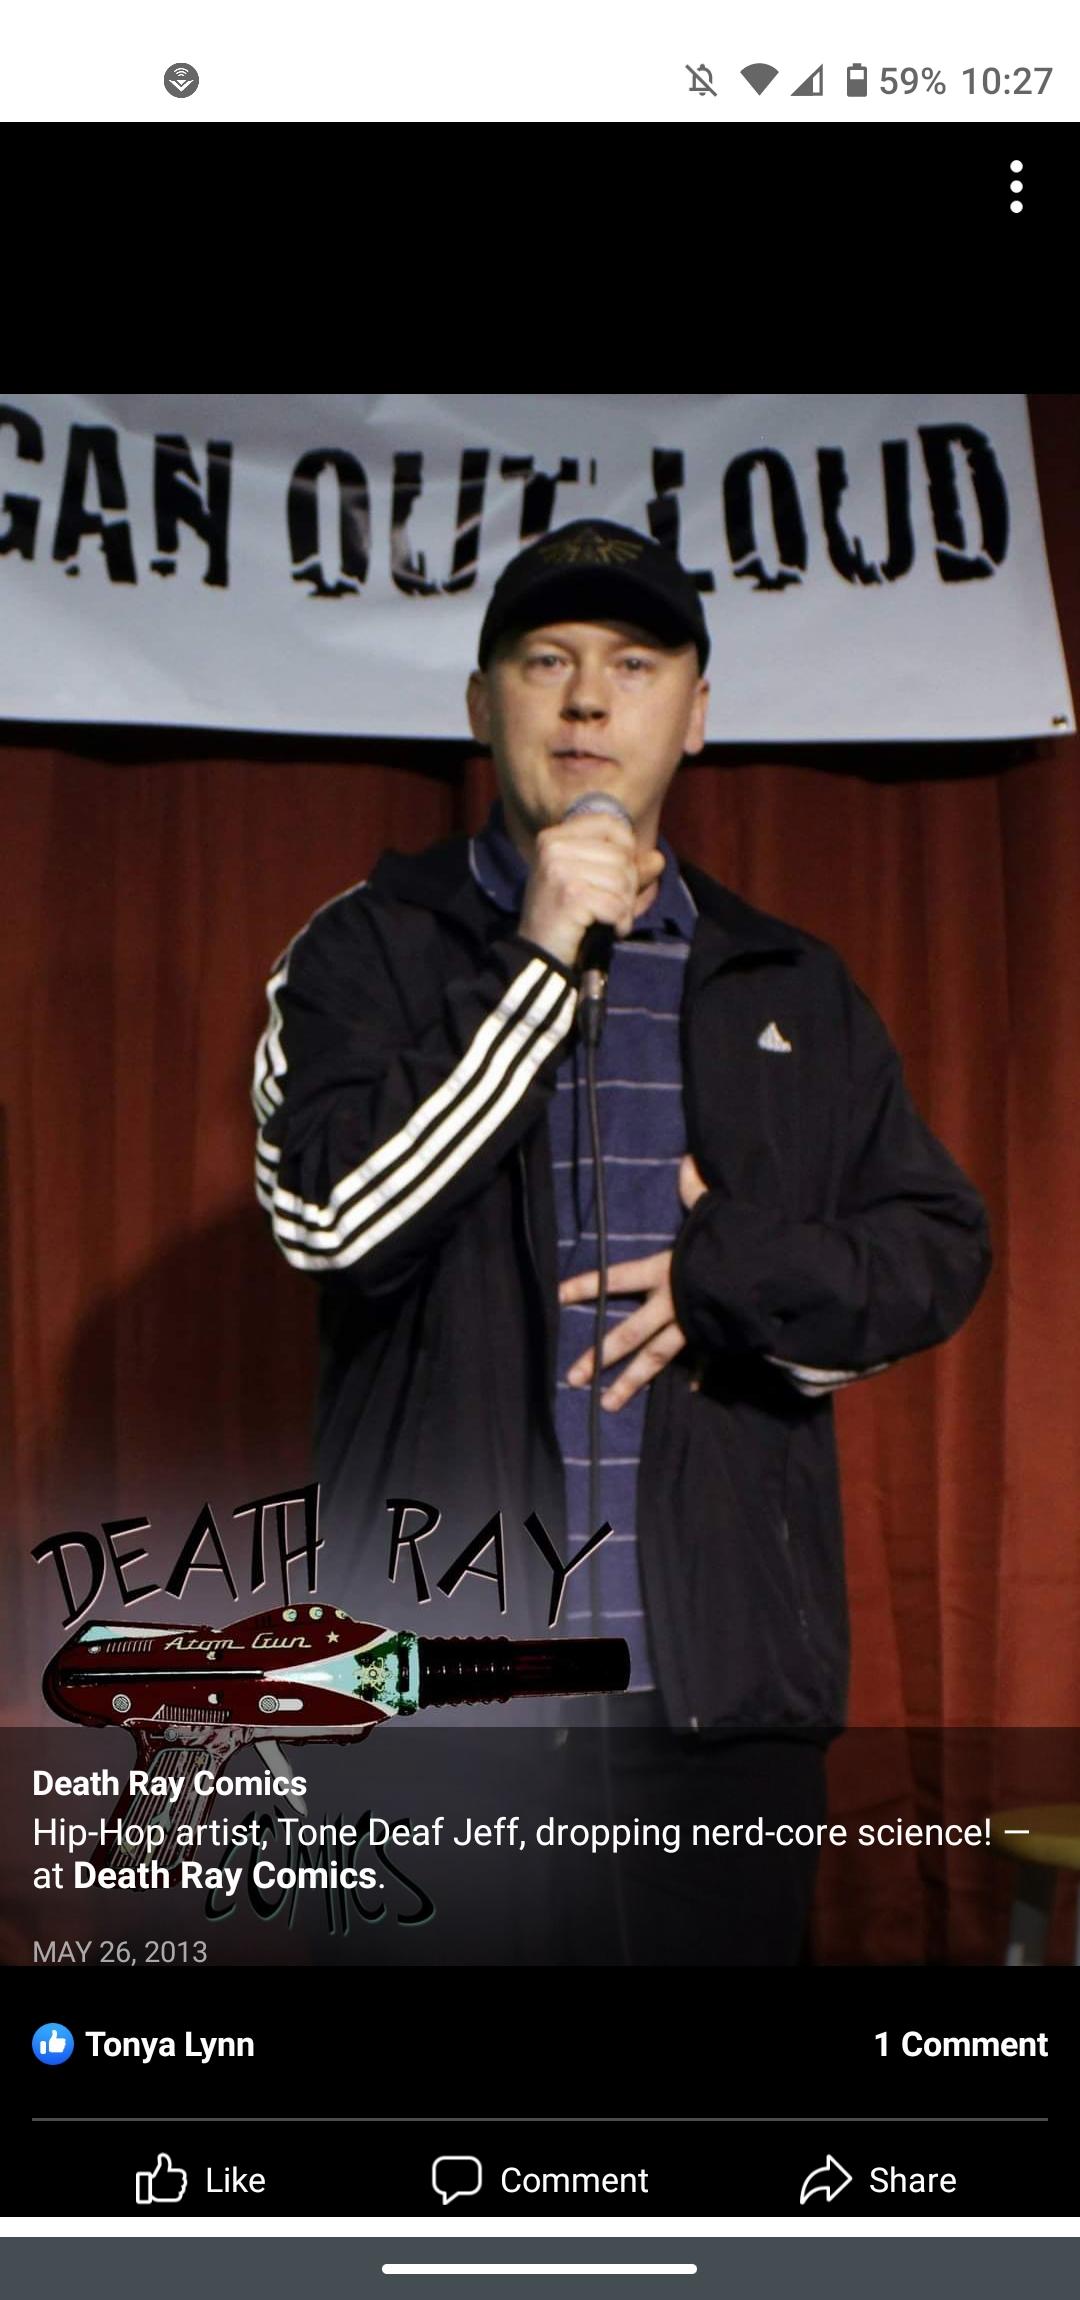 Death Ray 5.26.13